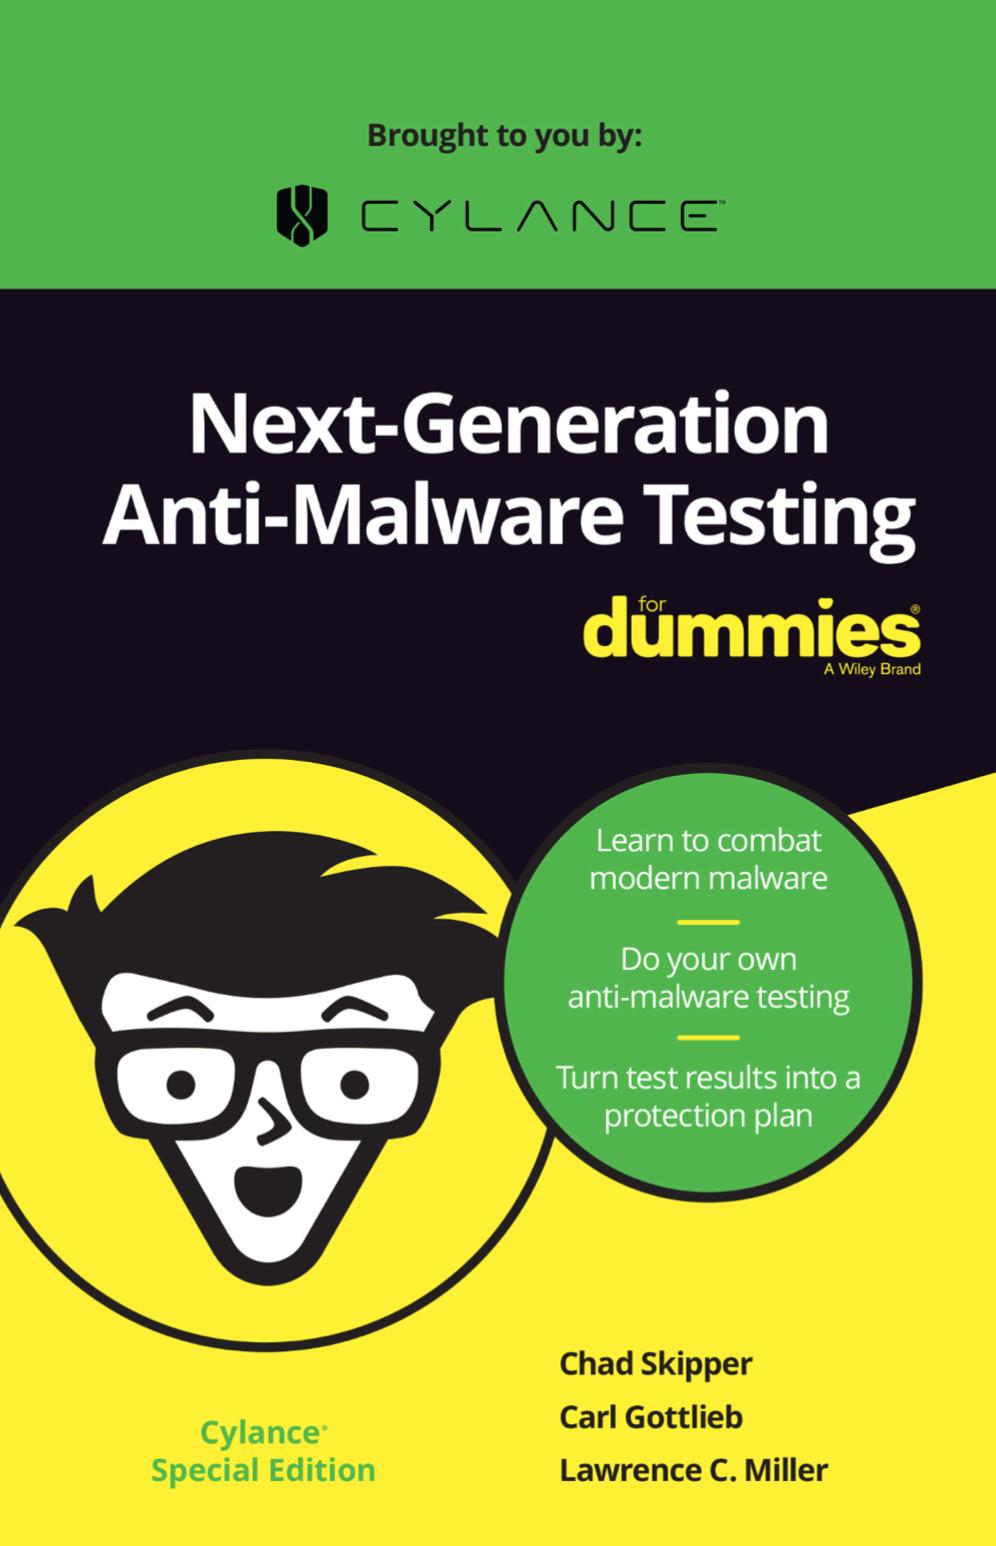 Next-Generation Anti-Malware Testing